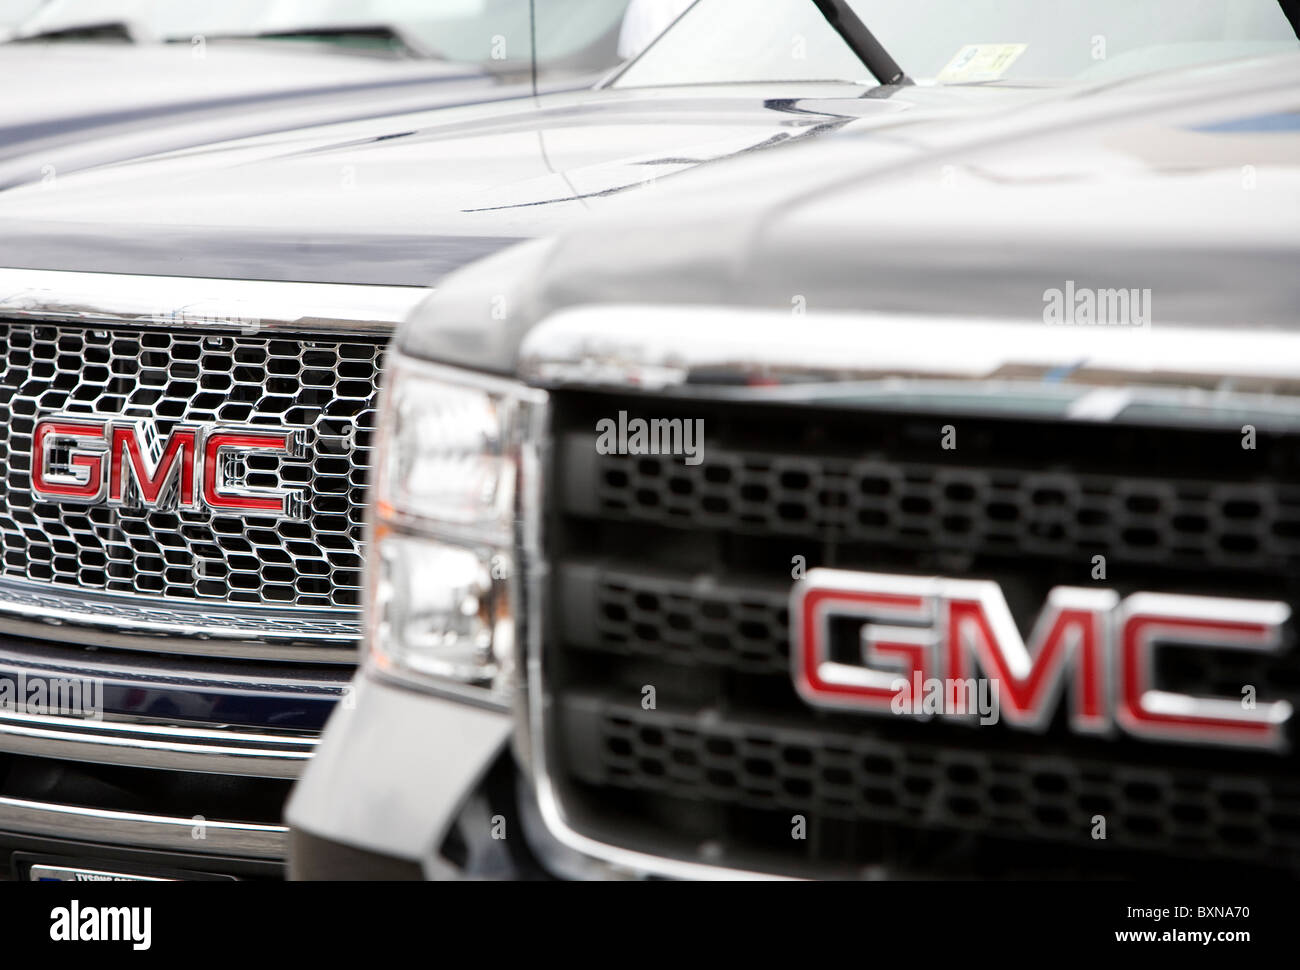 General Motors Dealer Lot Stock Photos & General Motors ...